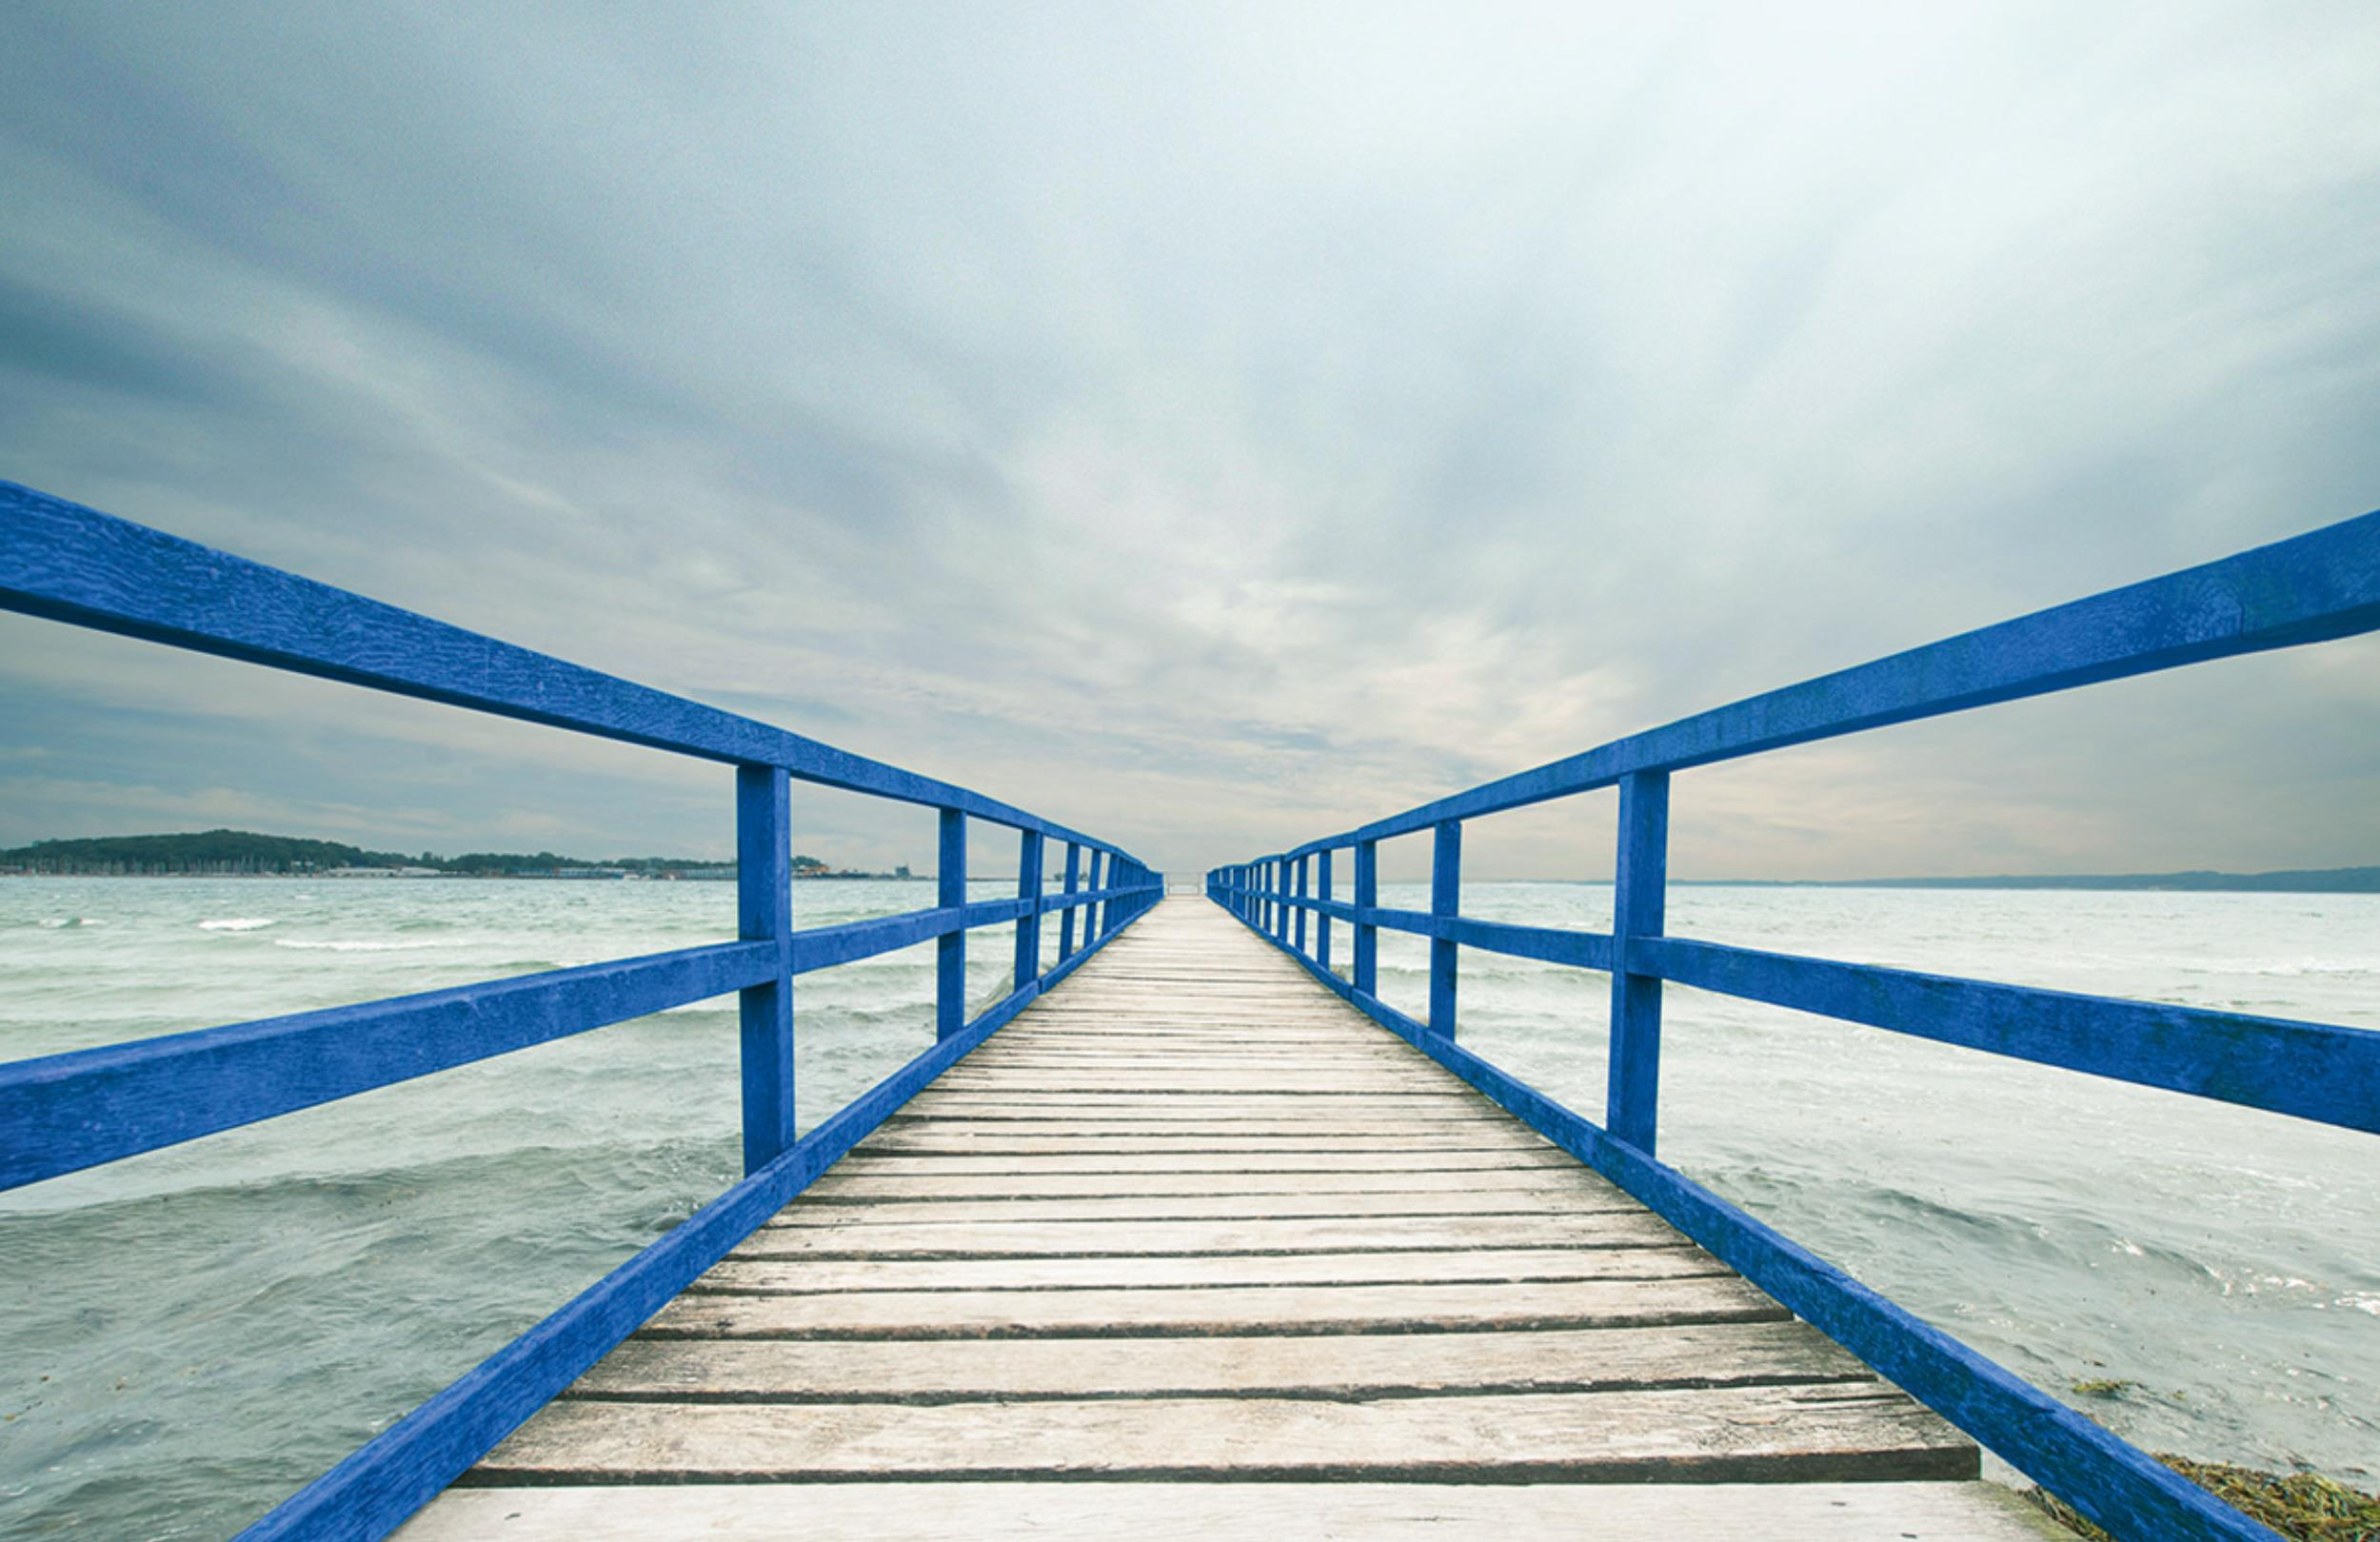 Pont avec rampe bleue